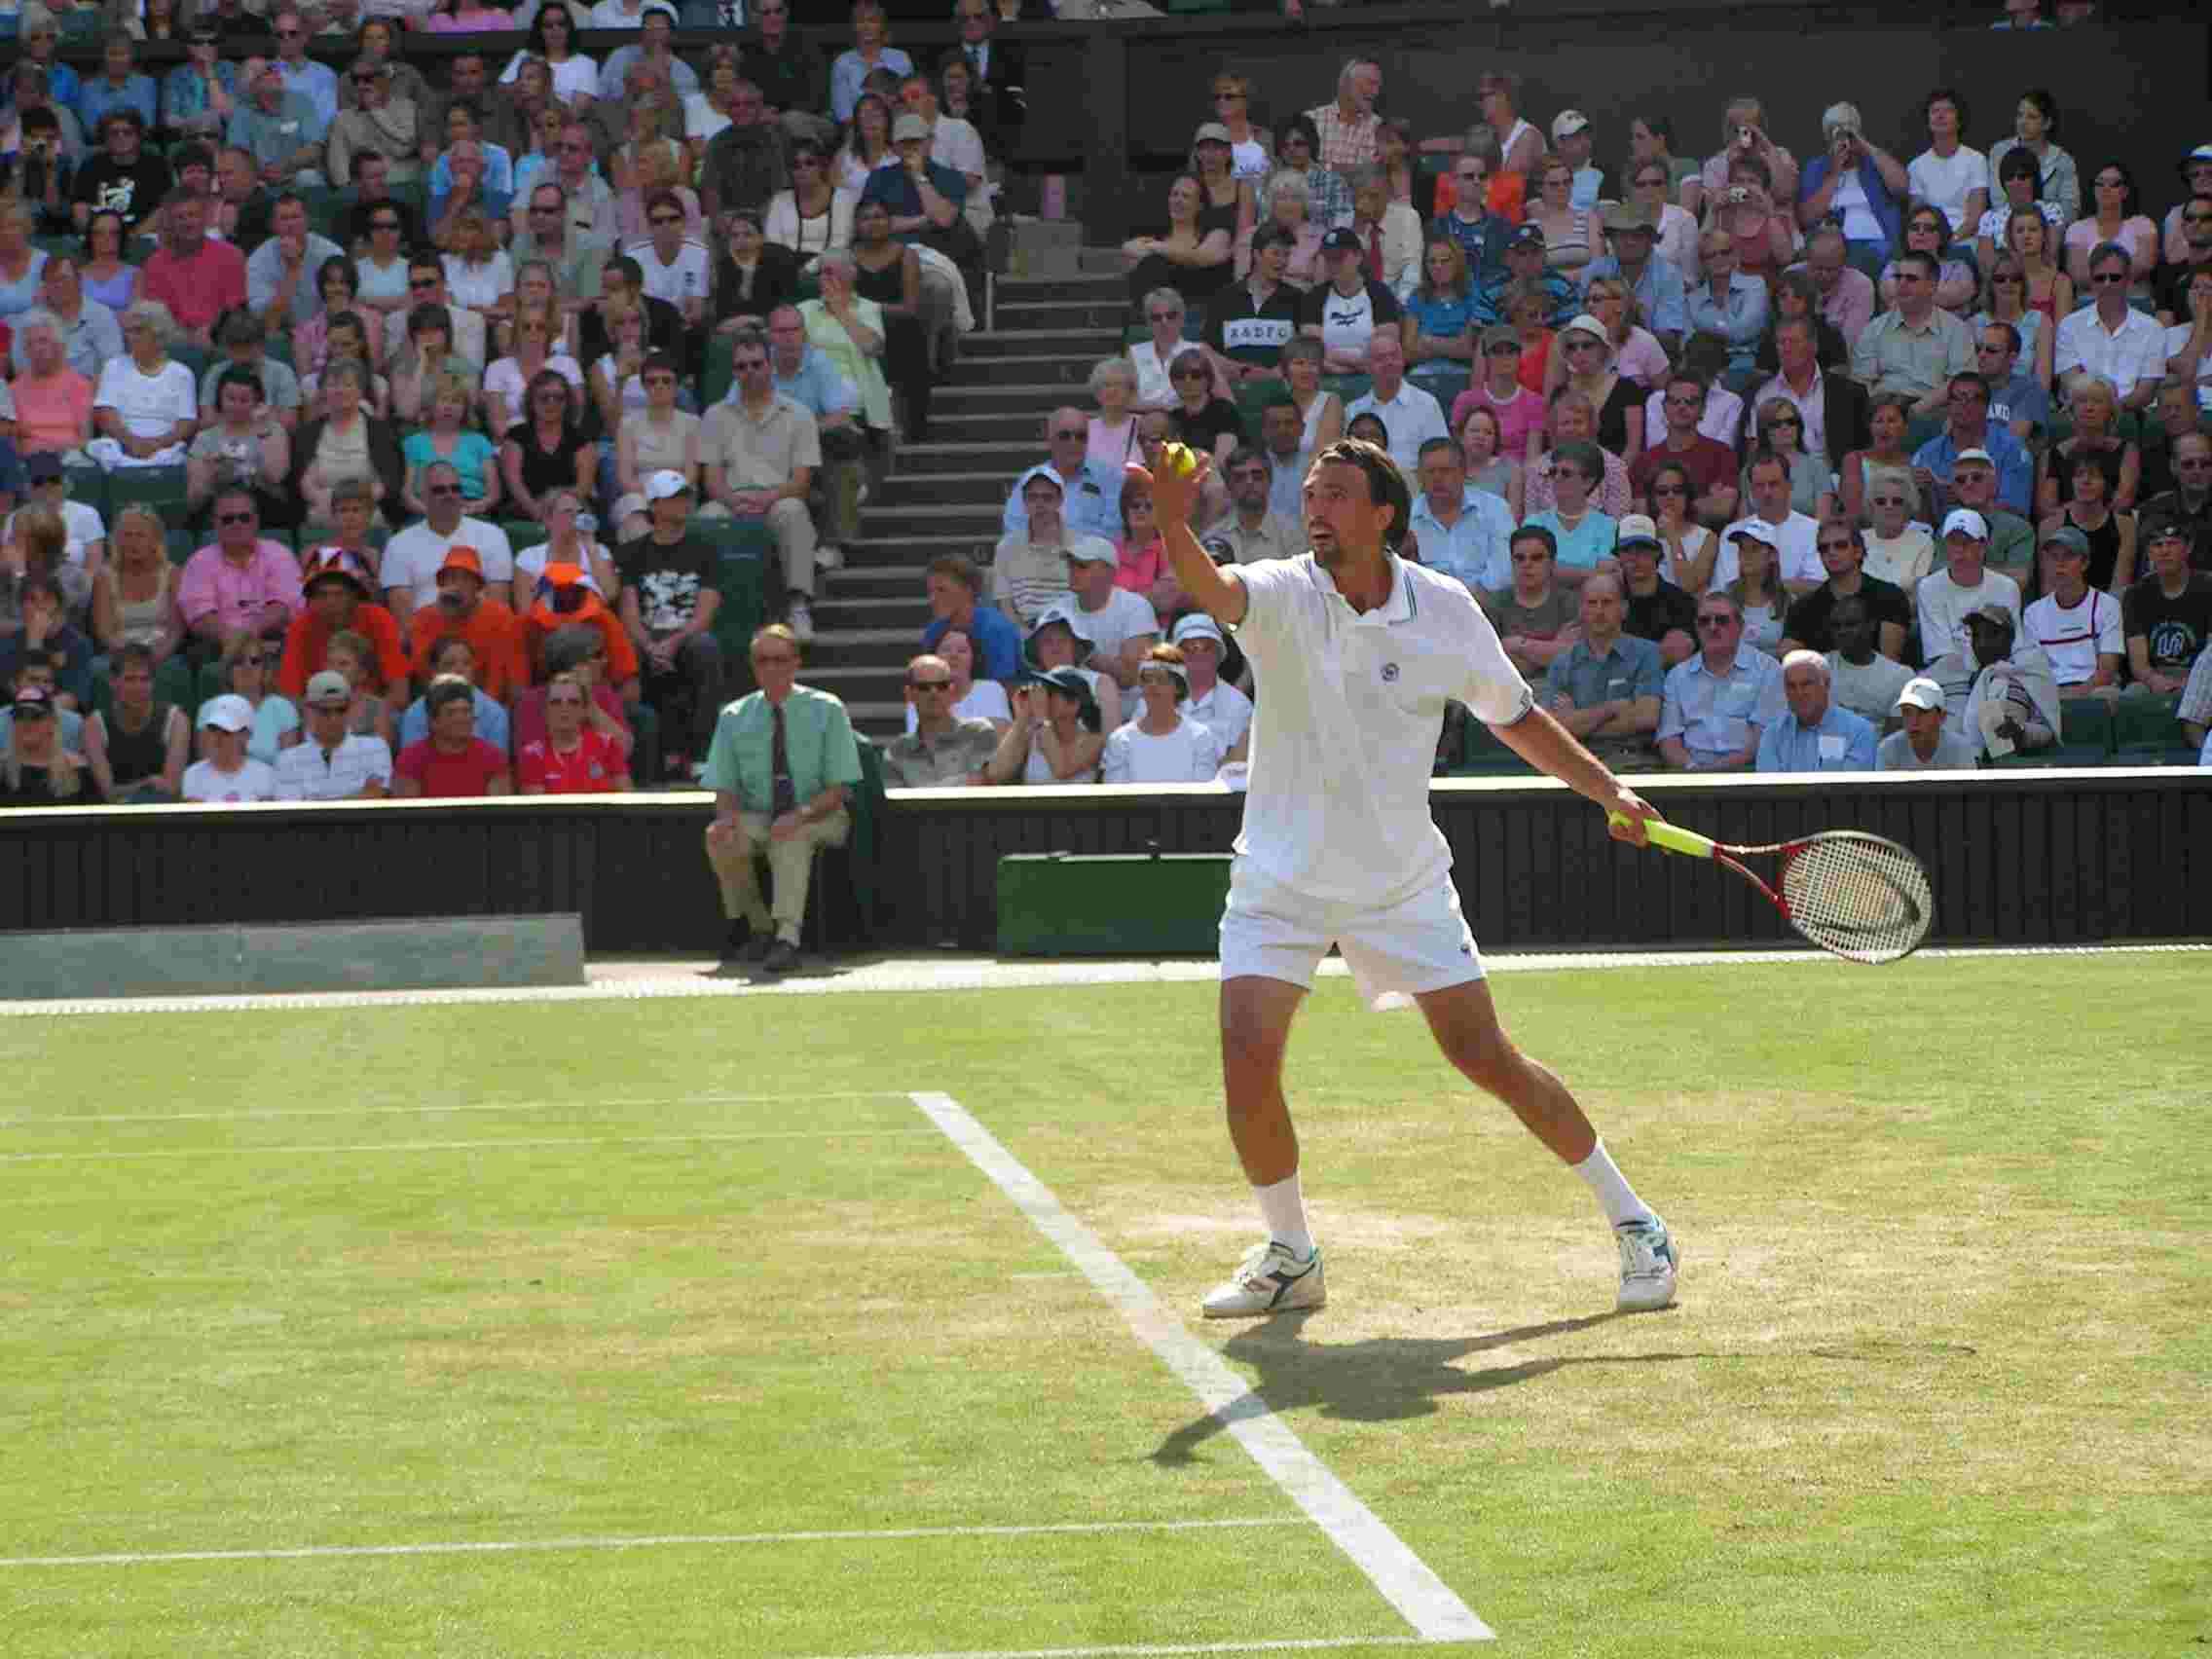 Goran Ivanisevic Winning Wimbledon in 2001